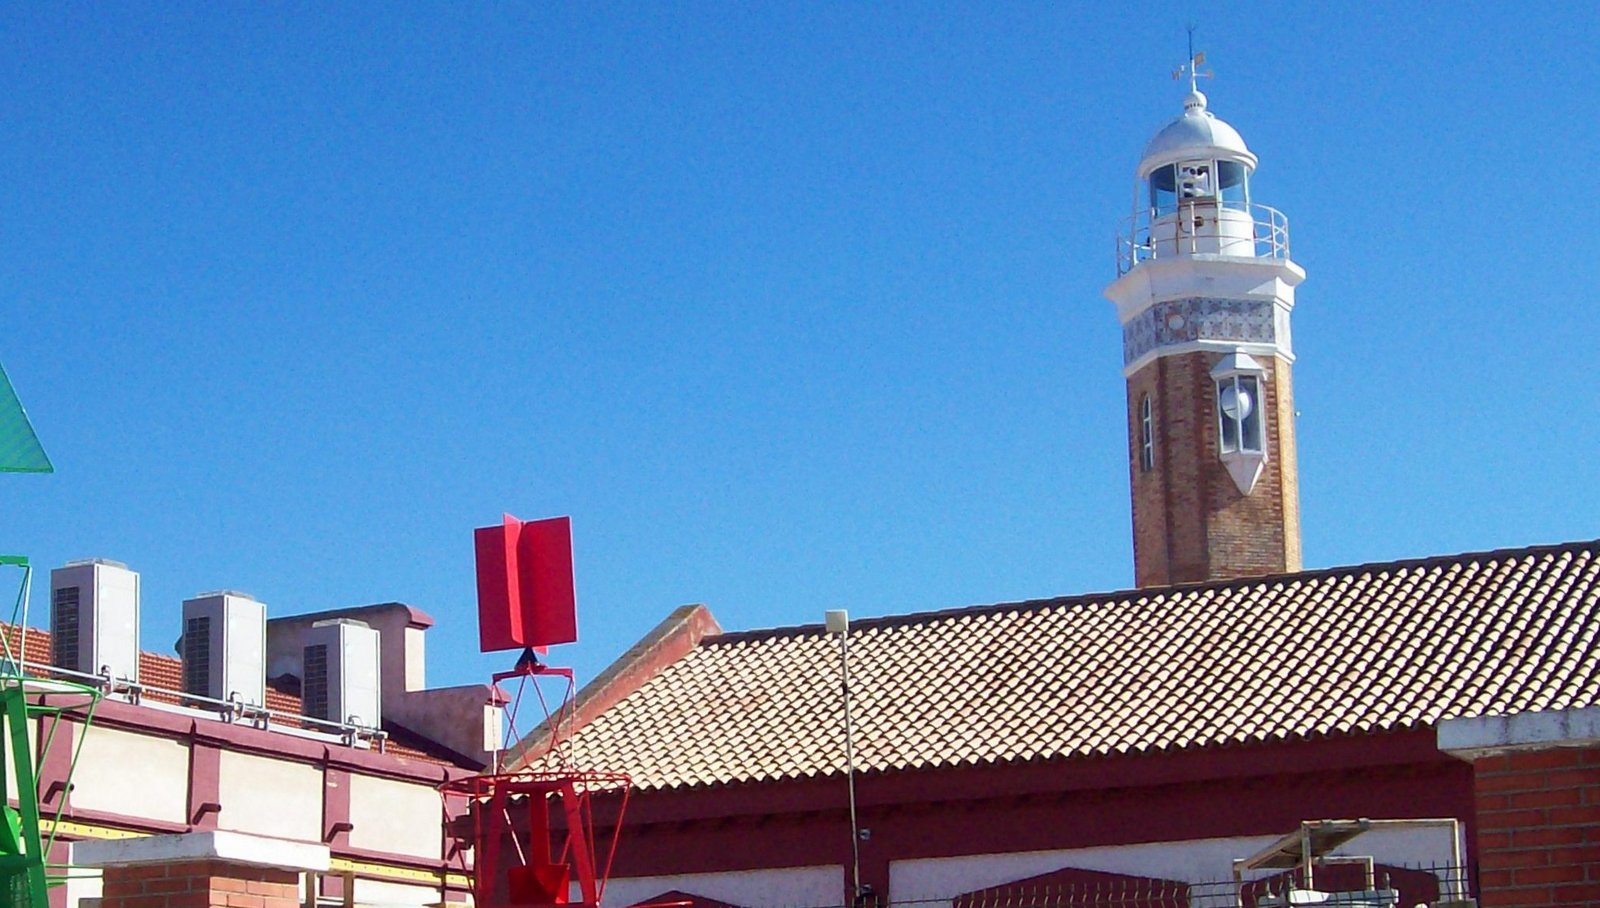 Bonanza am Guadalquivier